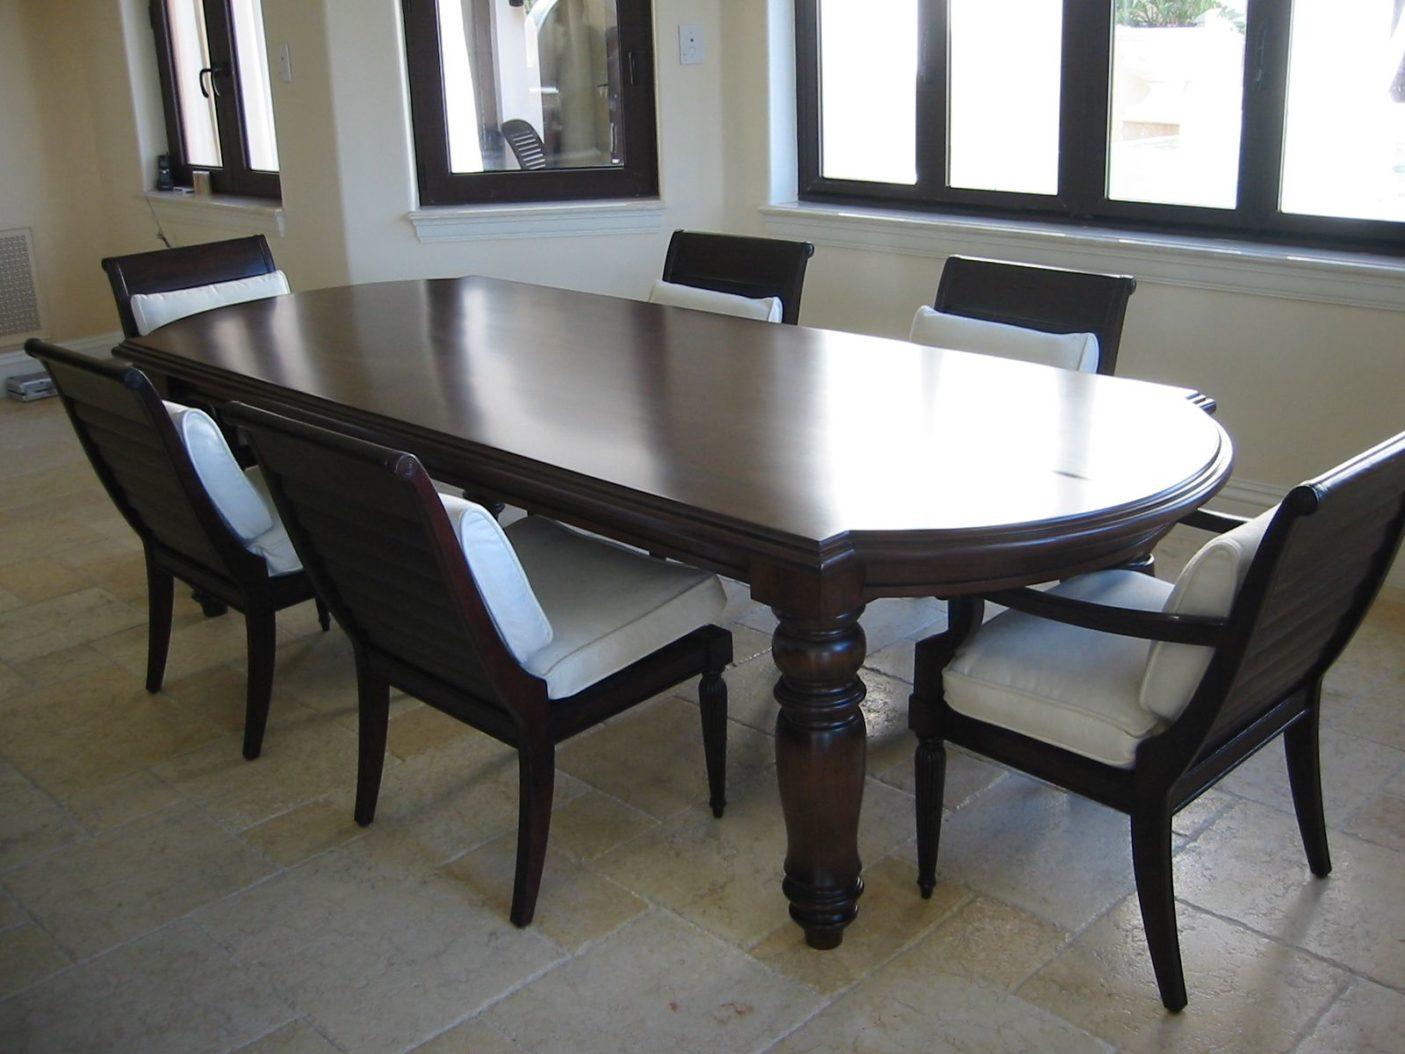 Tables-28.jpg